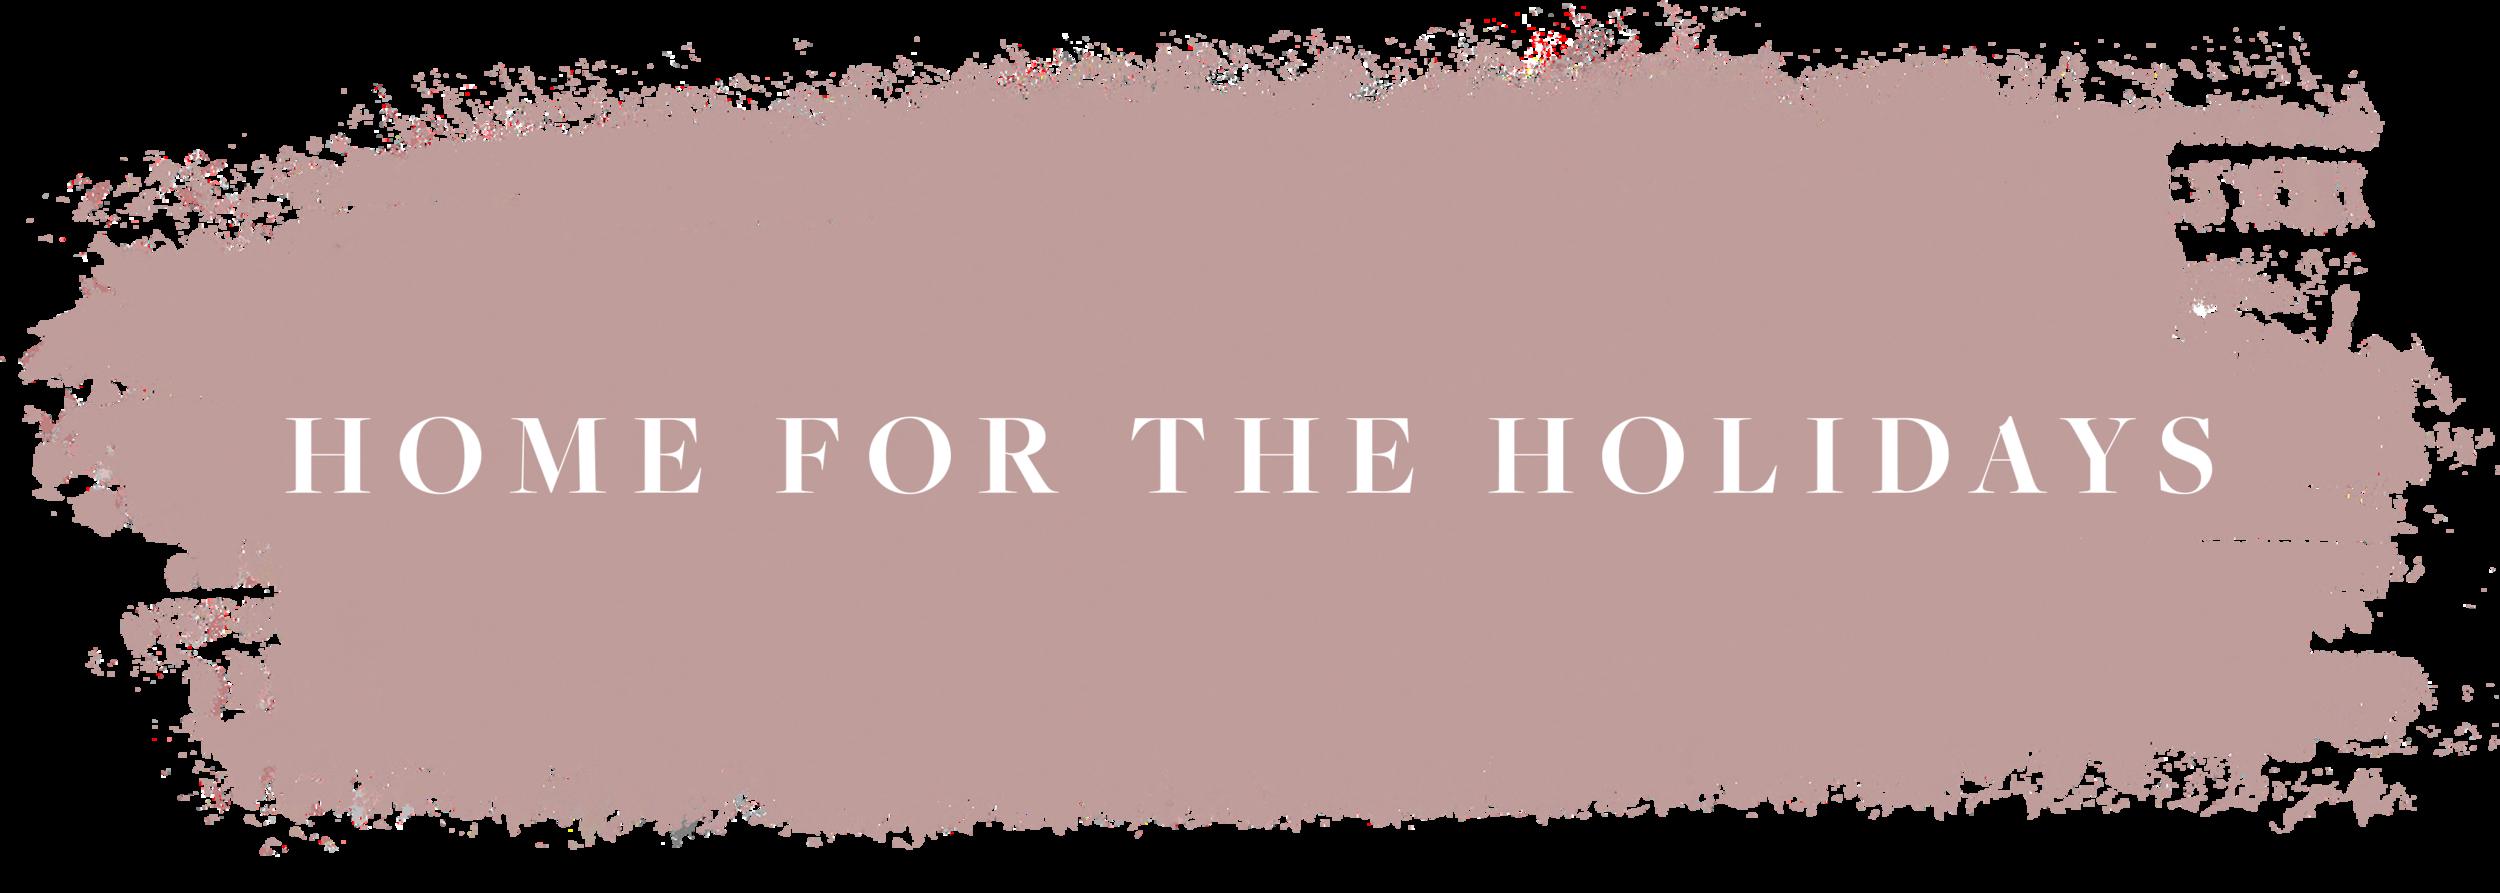 HOMEFORTHEHOLIDAYS2018.png